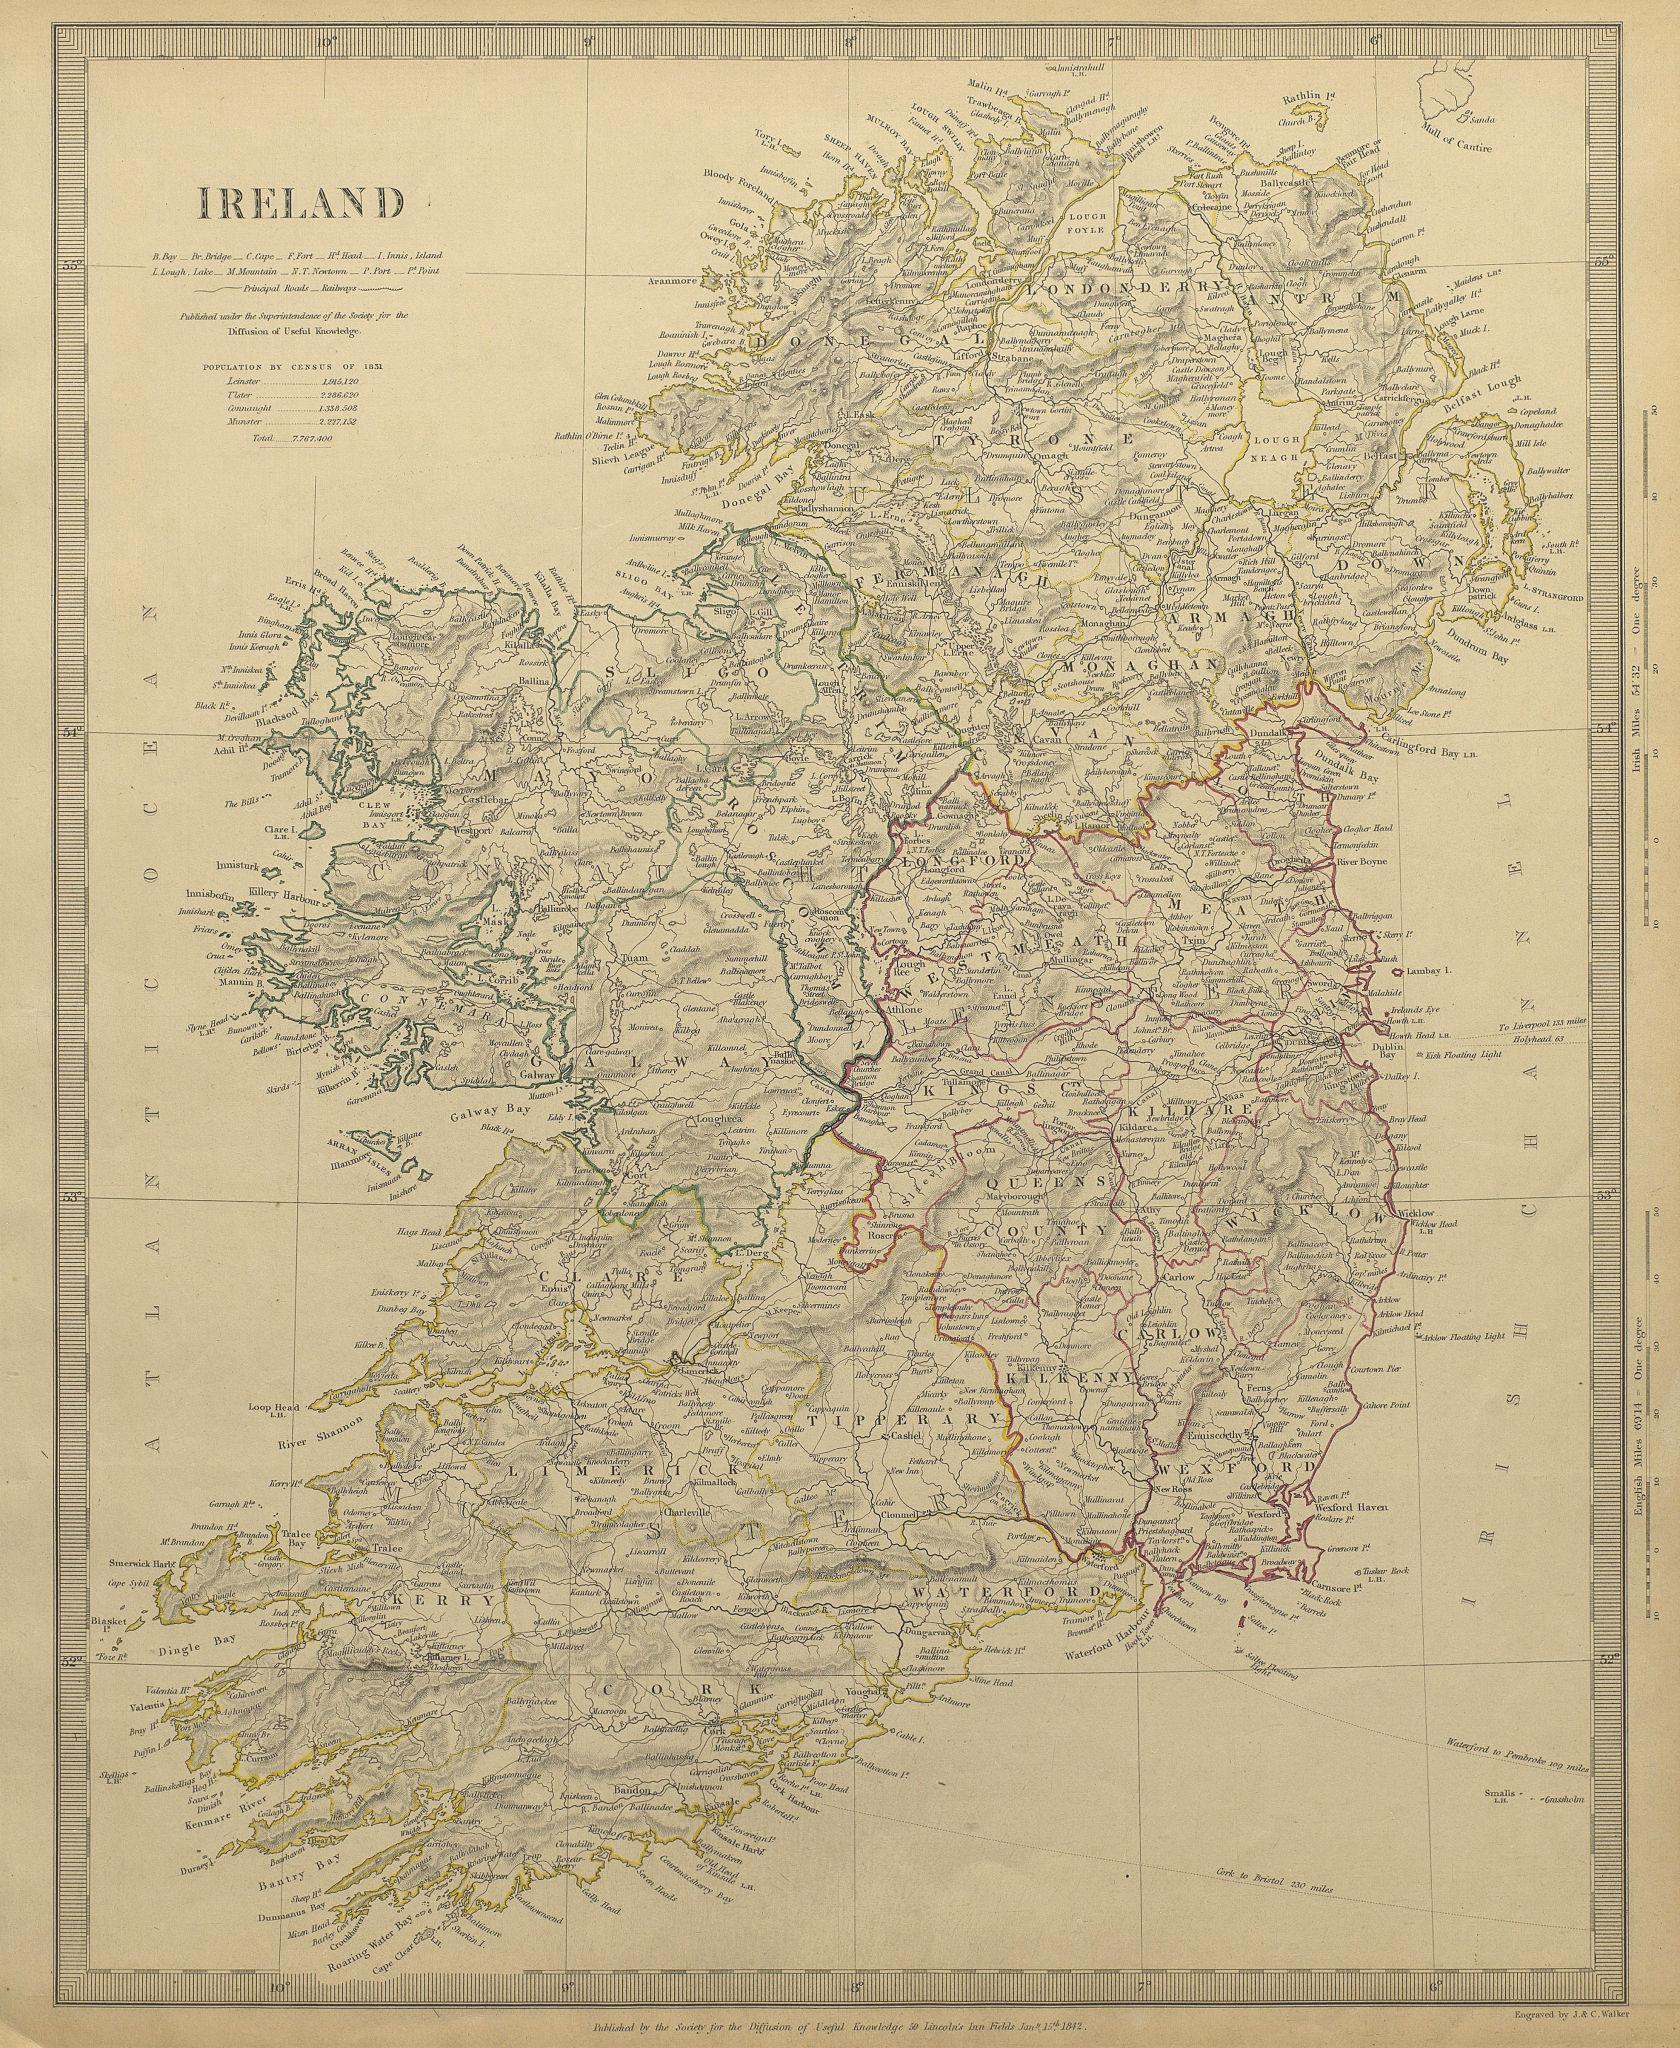 IRELAND with roads. 1st Irish railway Kingstown-Dublin-Drogheda SDUK 1844 map